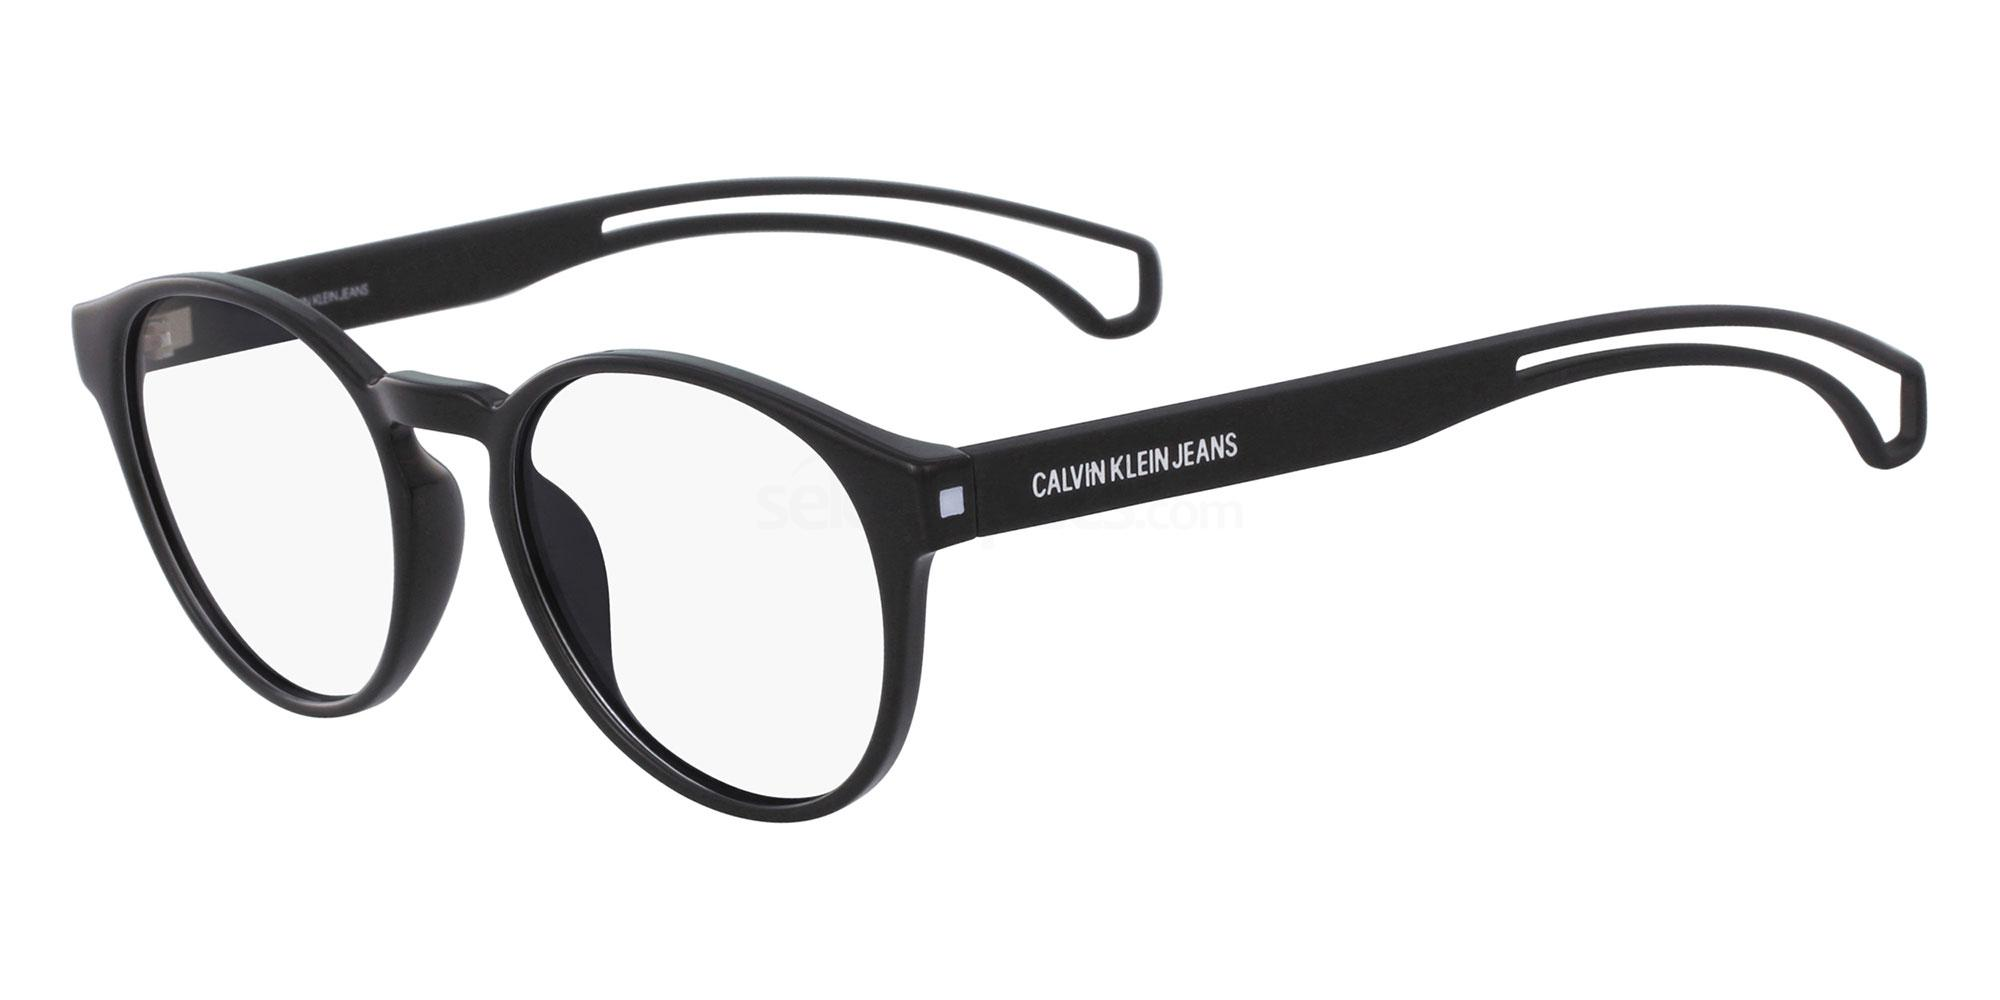 001 CKJ19508 Glasses, Calvin Klein Jeans